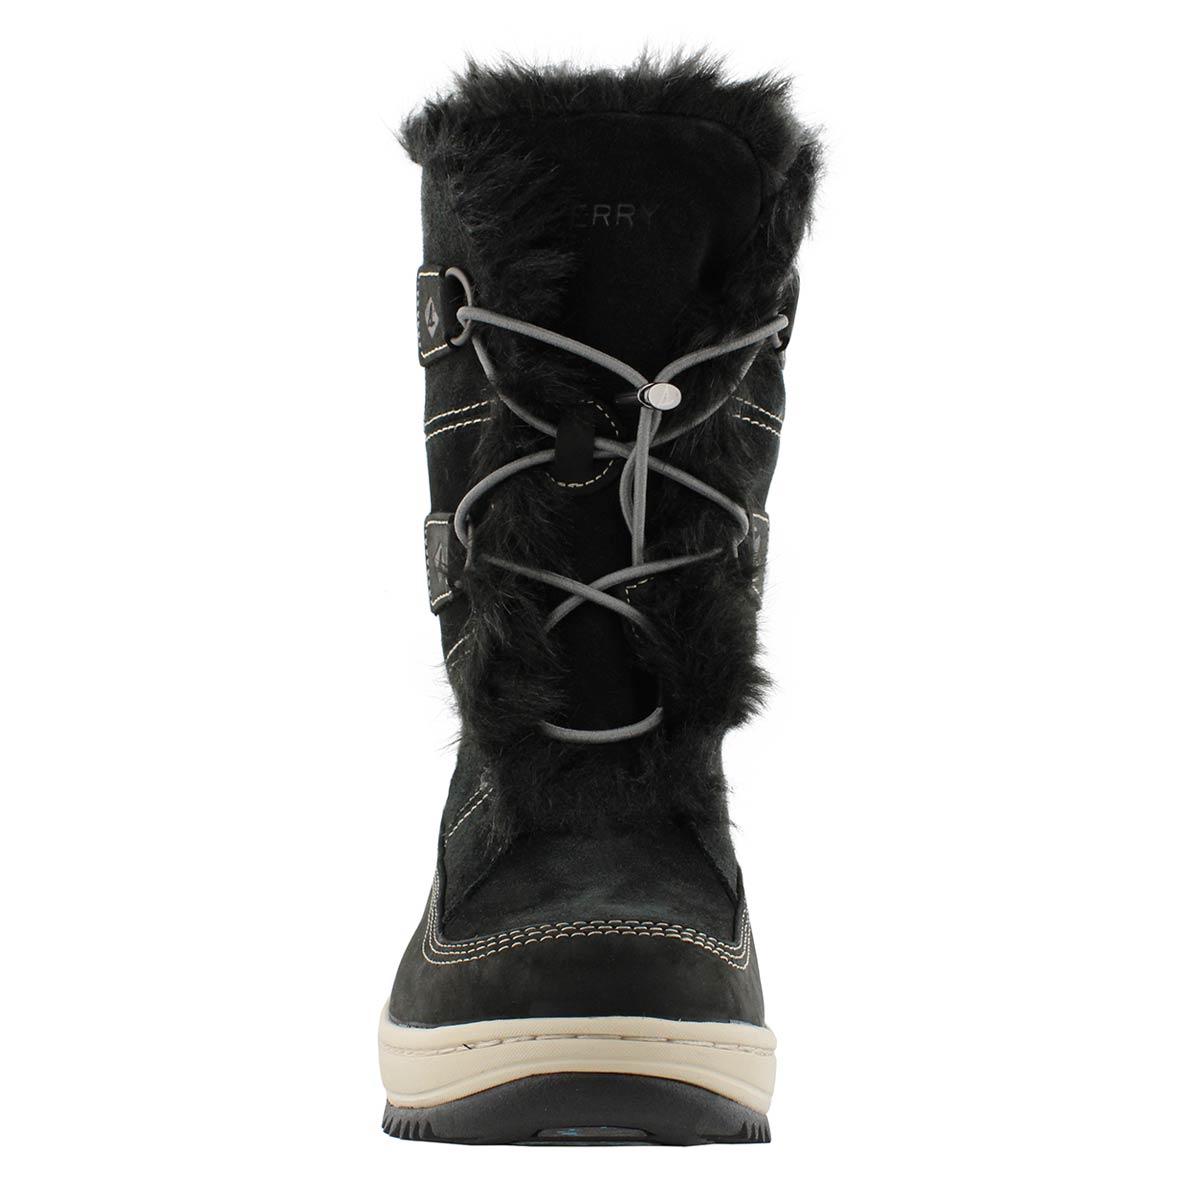 Lds Powder Valley black wtpf boot